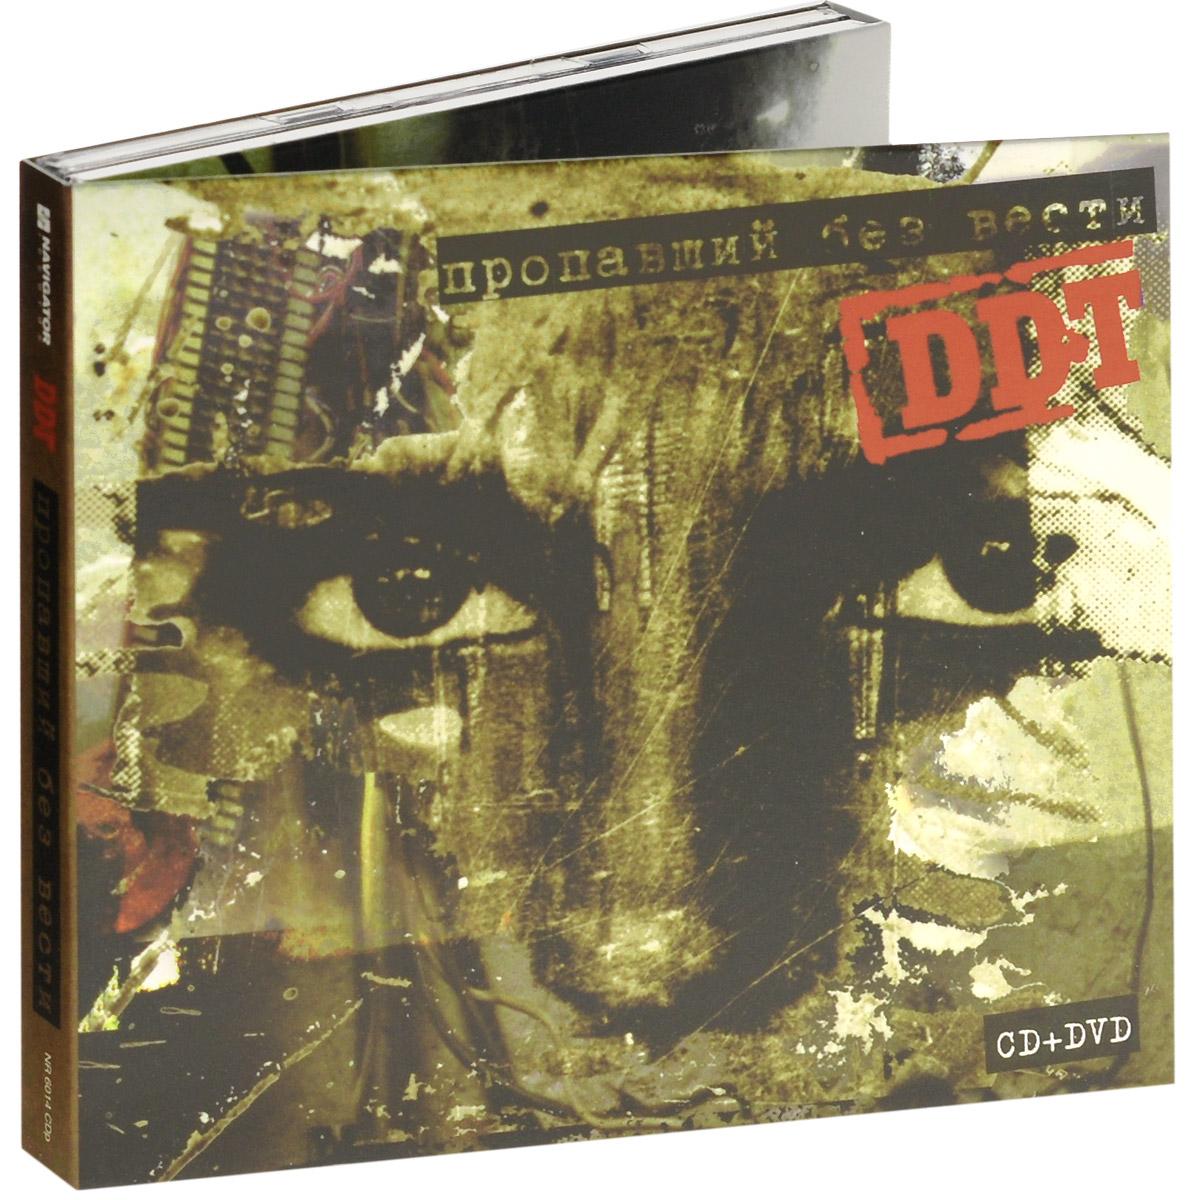 DDT DDT. Пропавший без вести (СD + DVD) rush replay x3 3 dvd cd